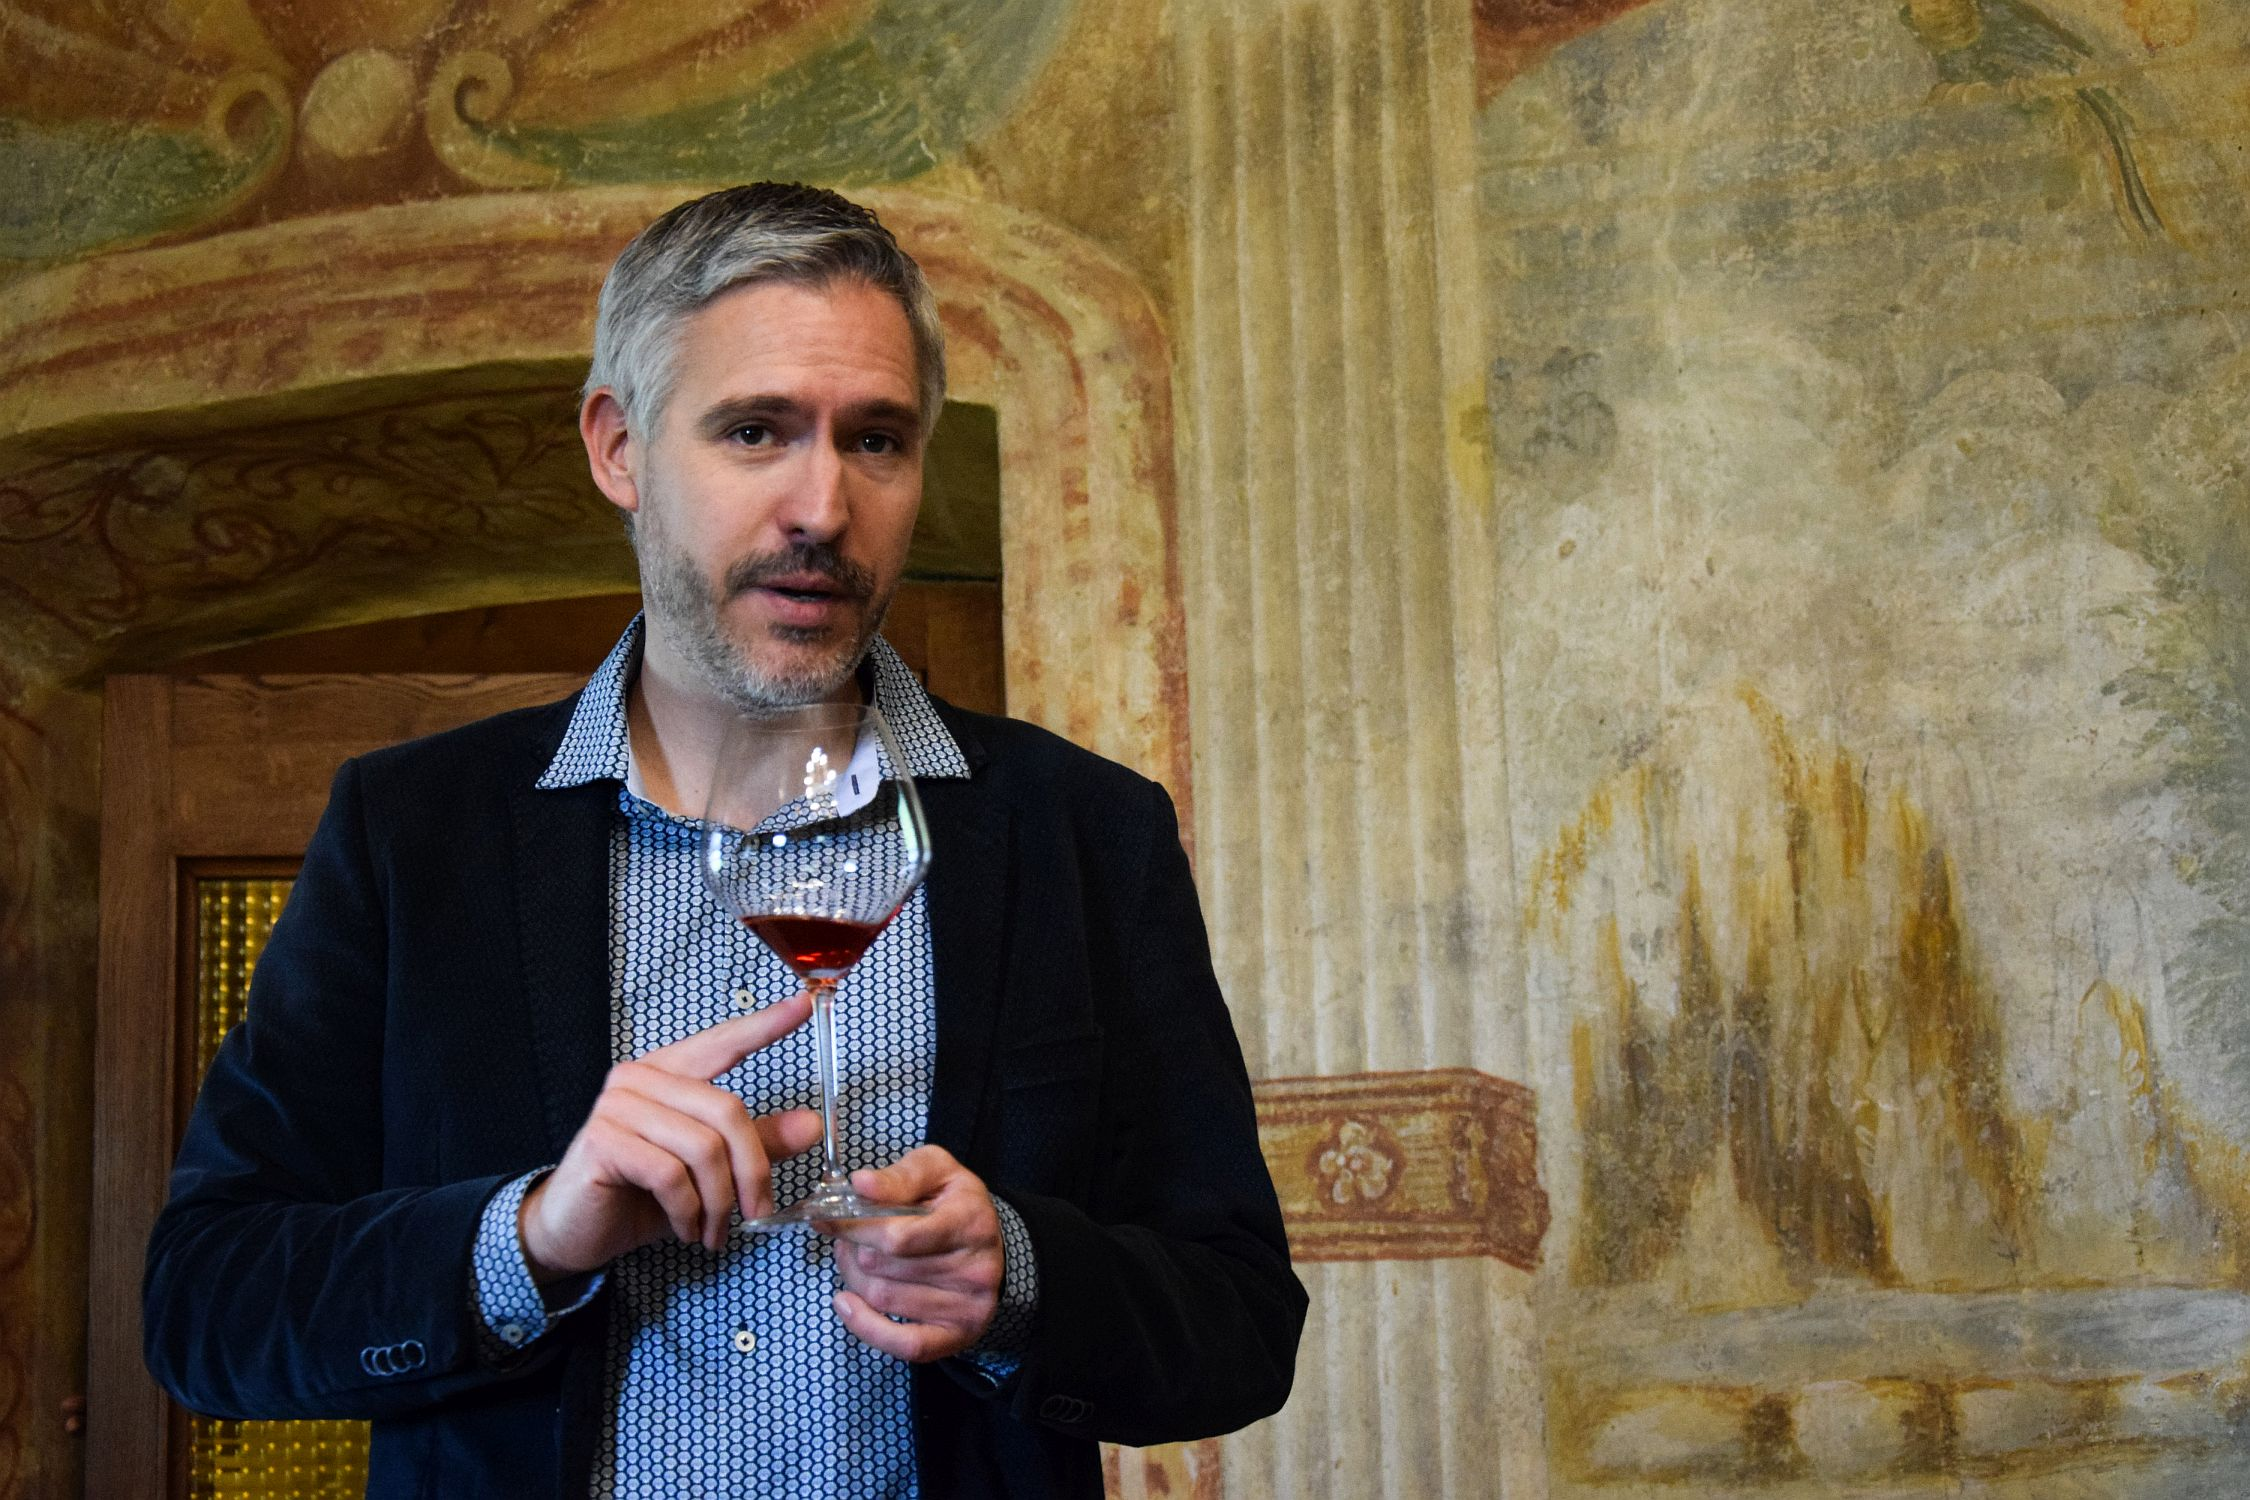 Oenologist & Perfumer Richard Pfister analyses a wine during Modri Les Noirs festival